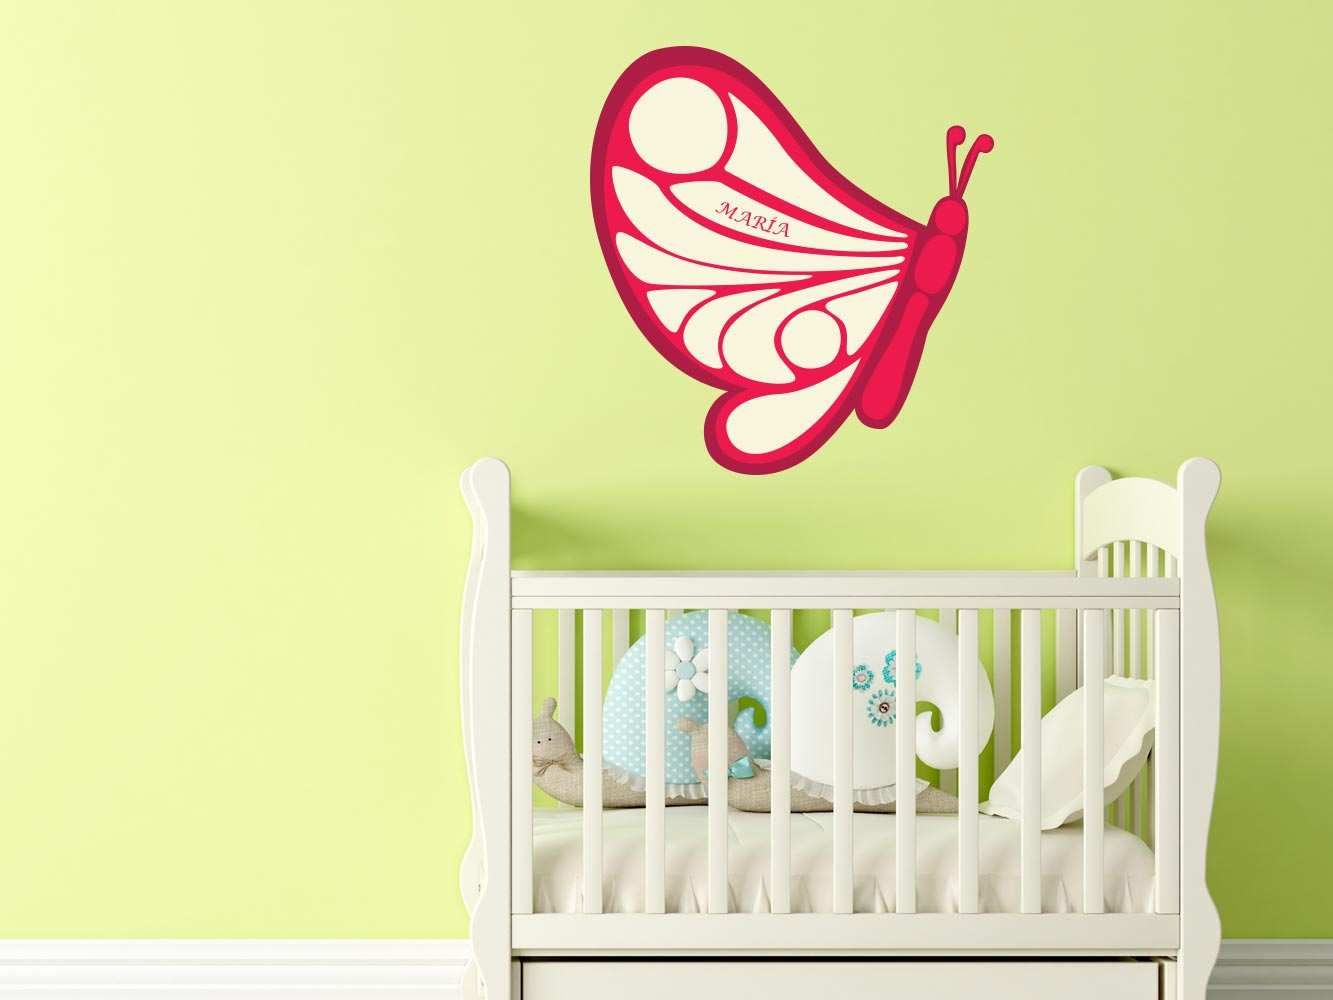 Vinilo Infantil Mariposa Roja Personalizado | Carteles XXL - Impresión carteleria publicitaria